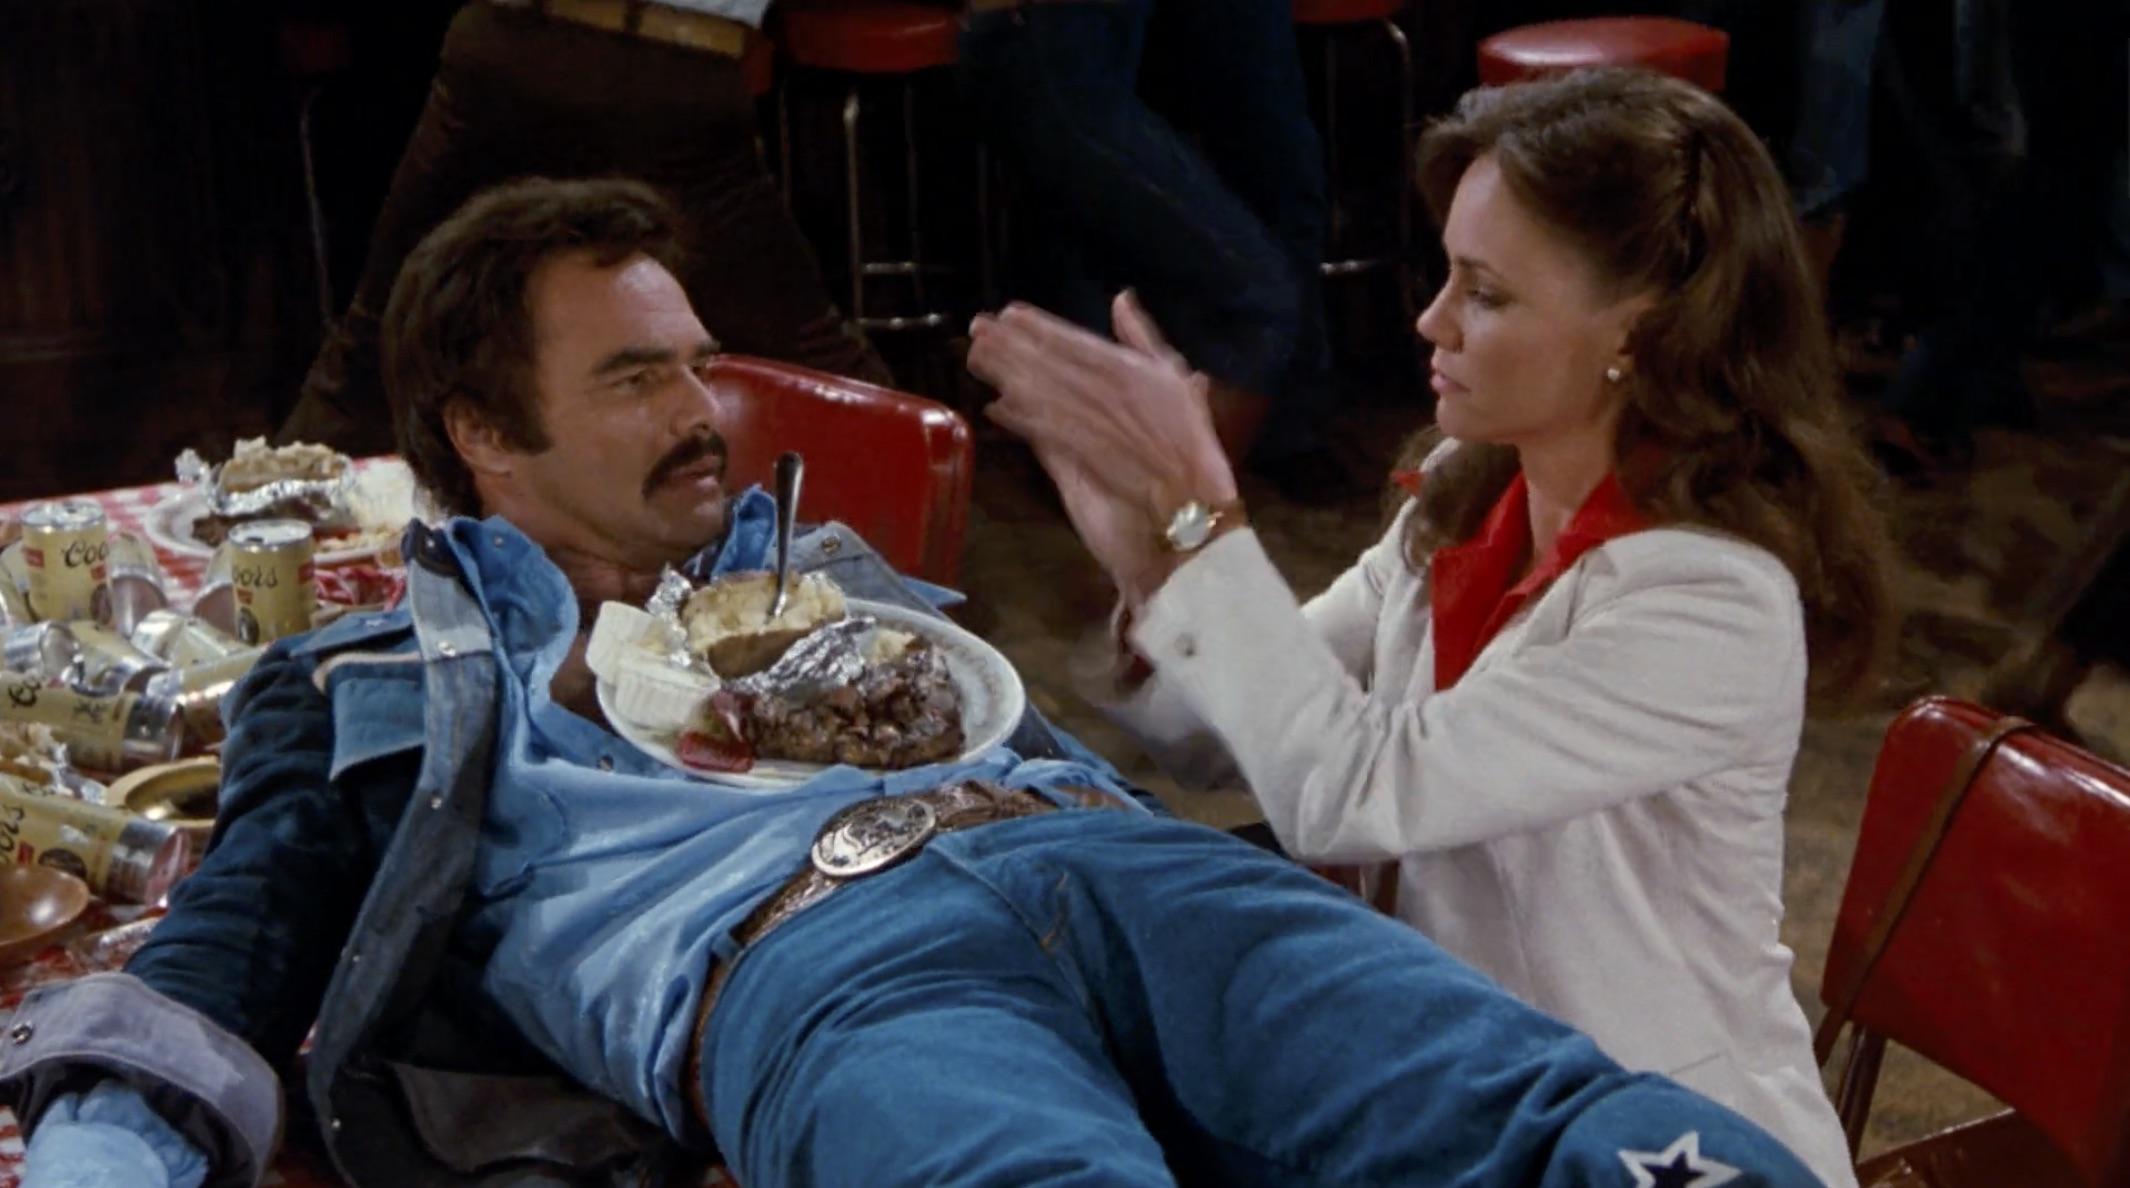 Burt Reynolds Hooper on table with food